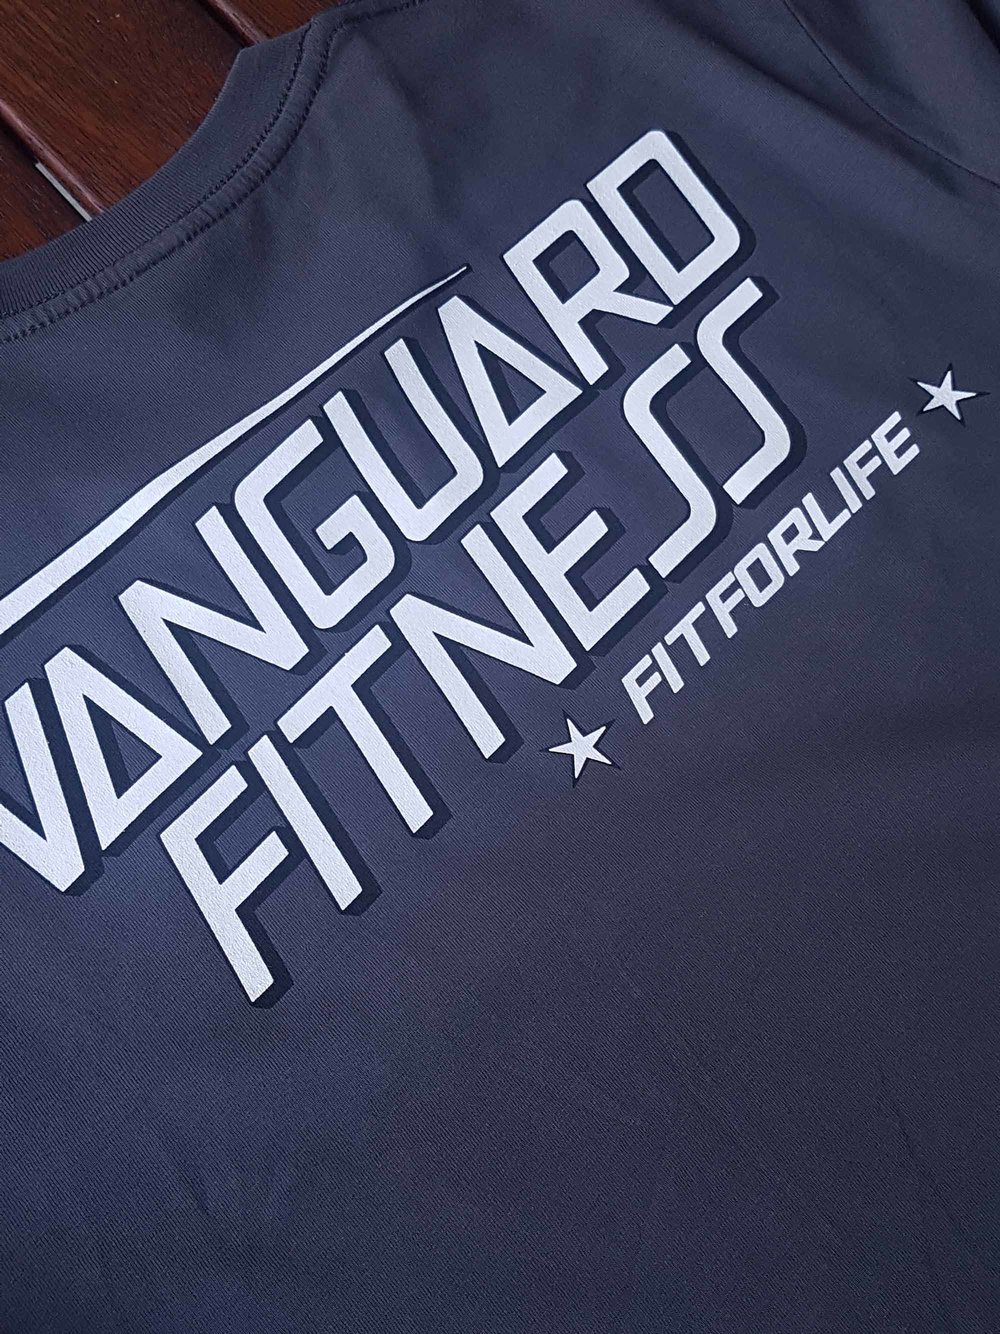 vanguard fitness backprint